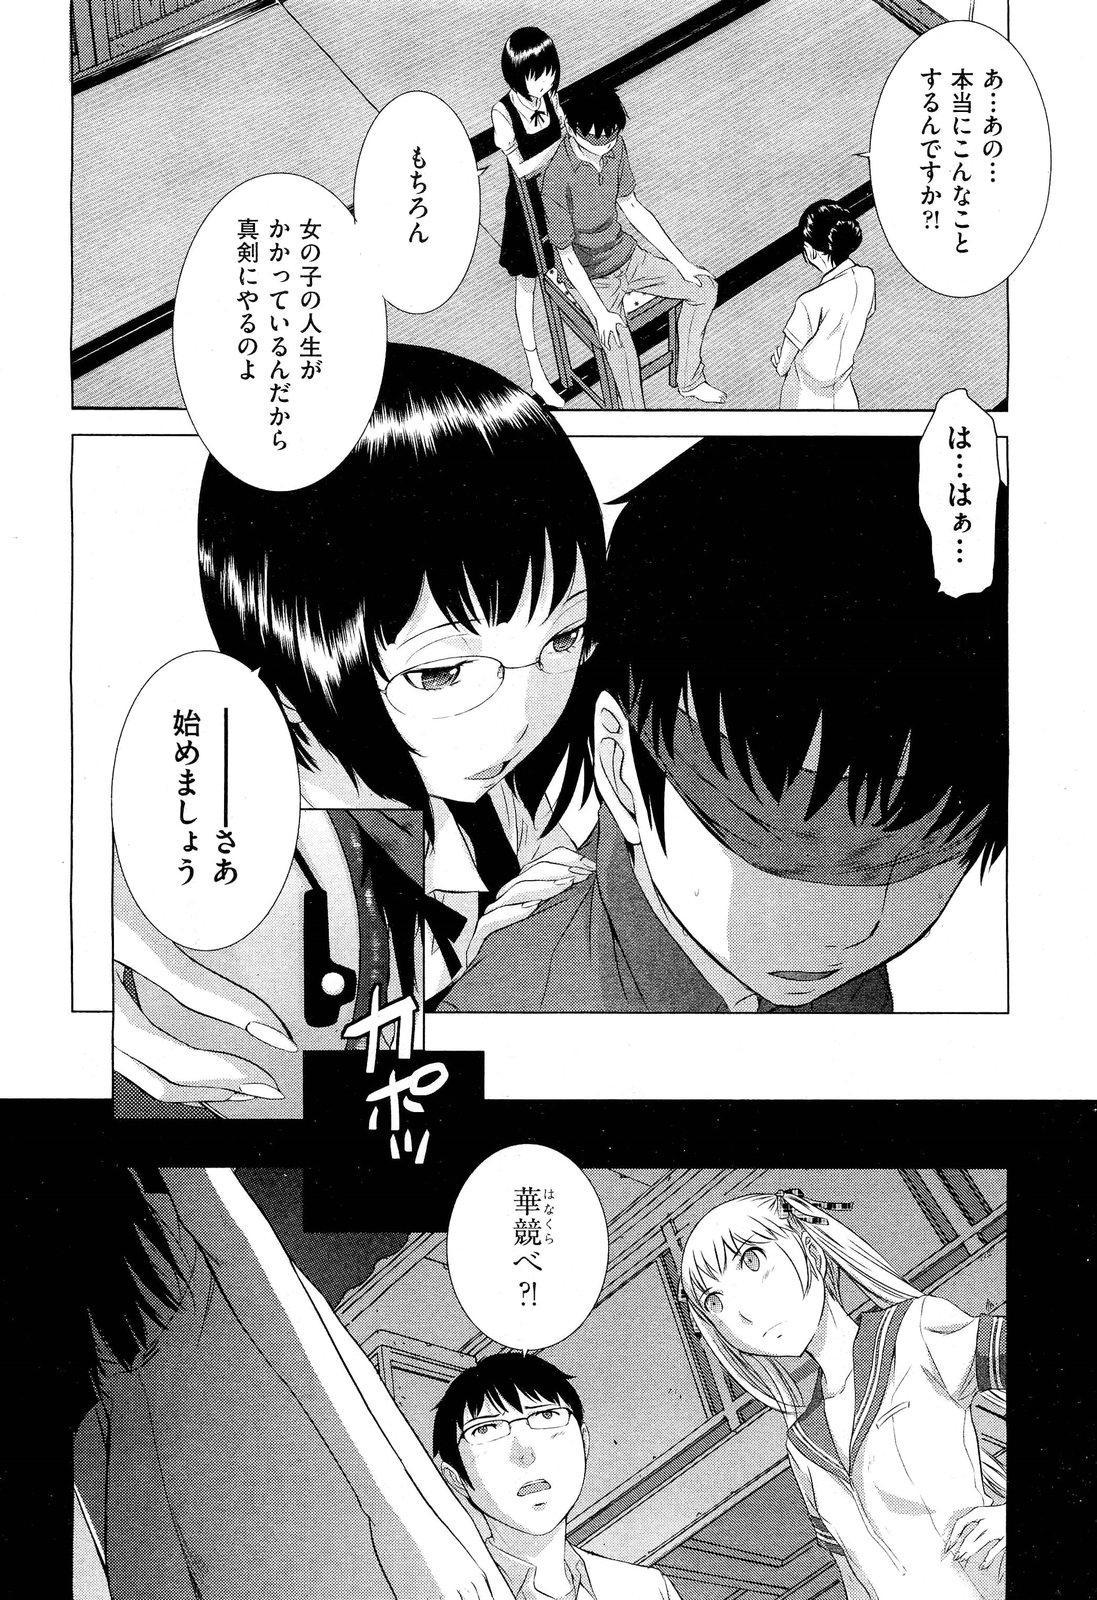 Hanazono 204